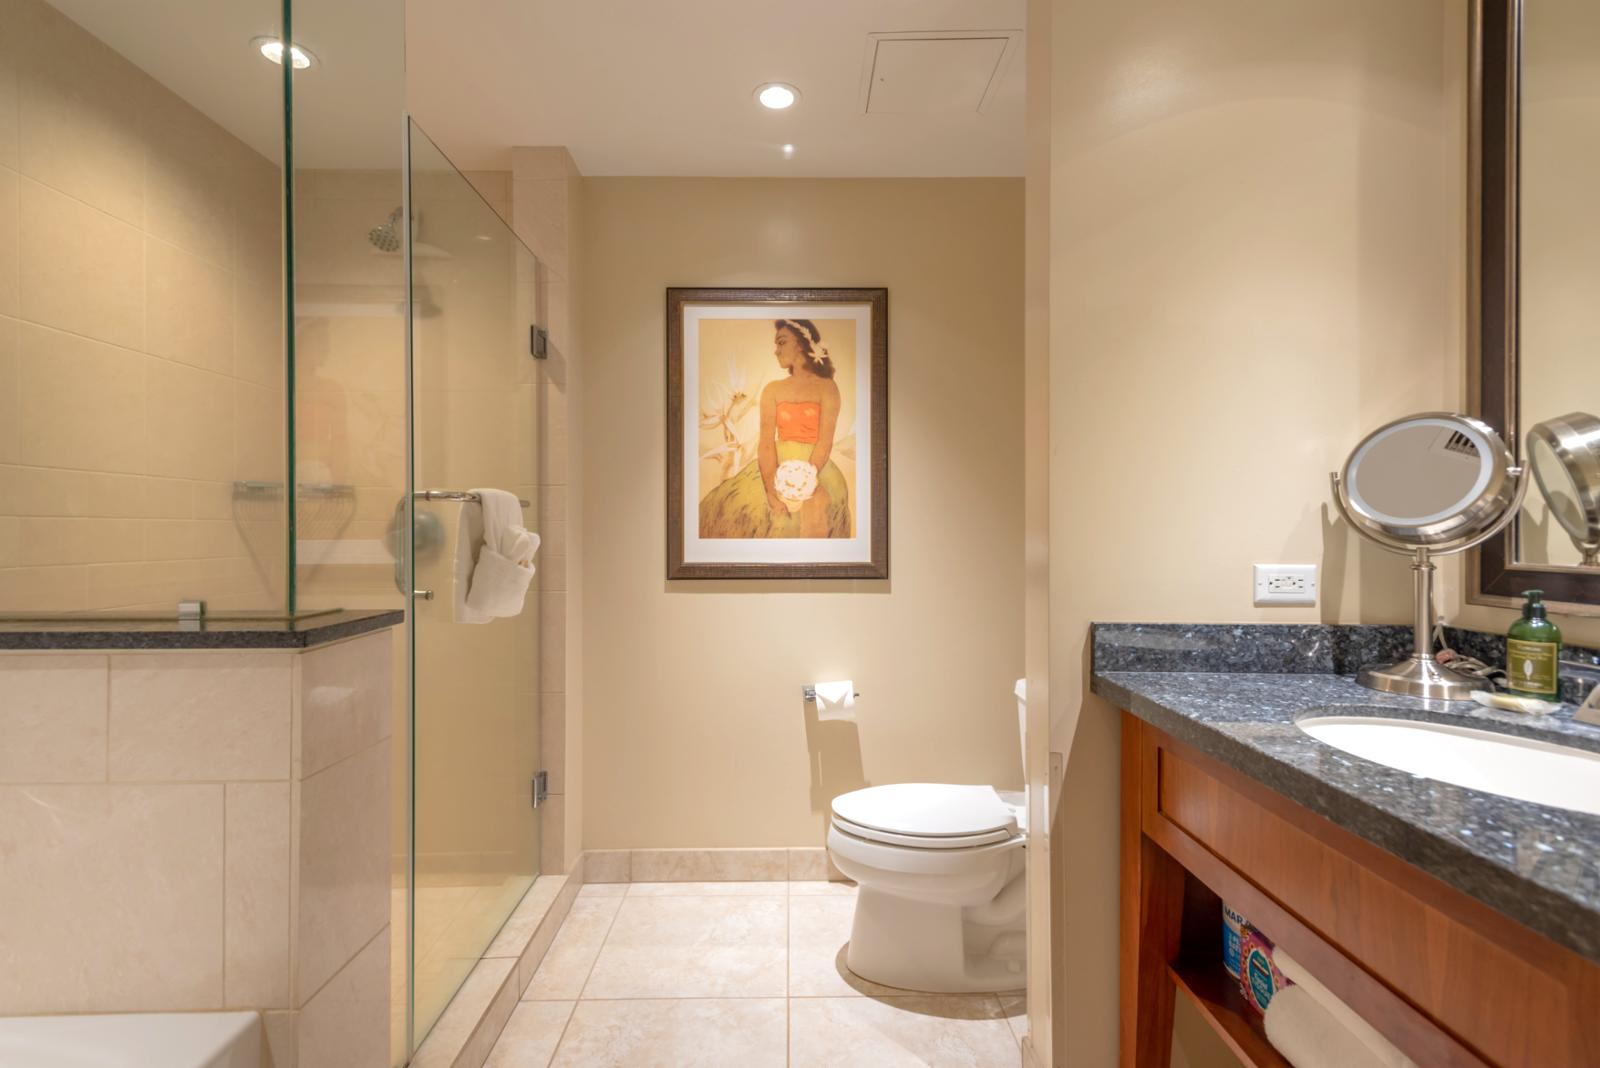 Spacious bathroom floorplan